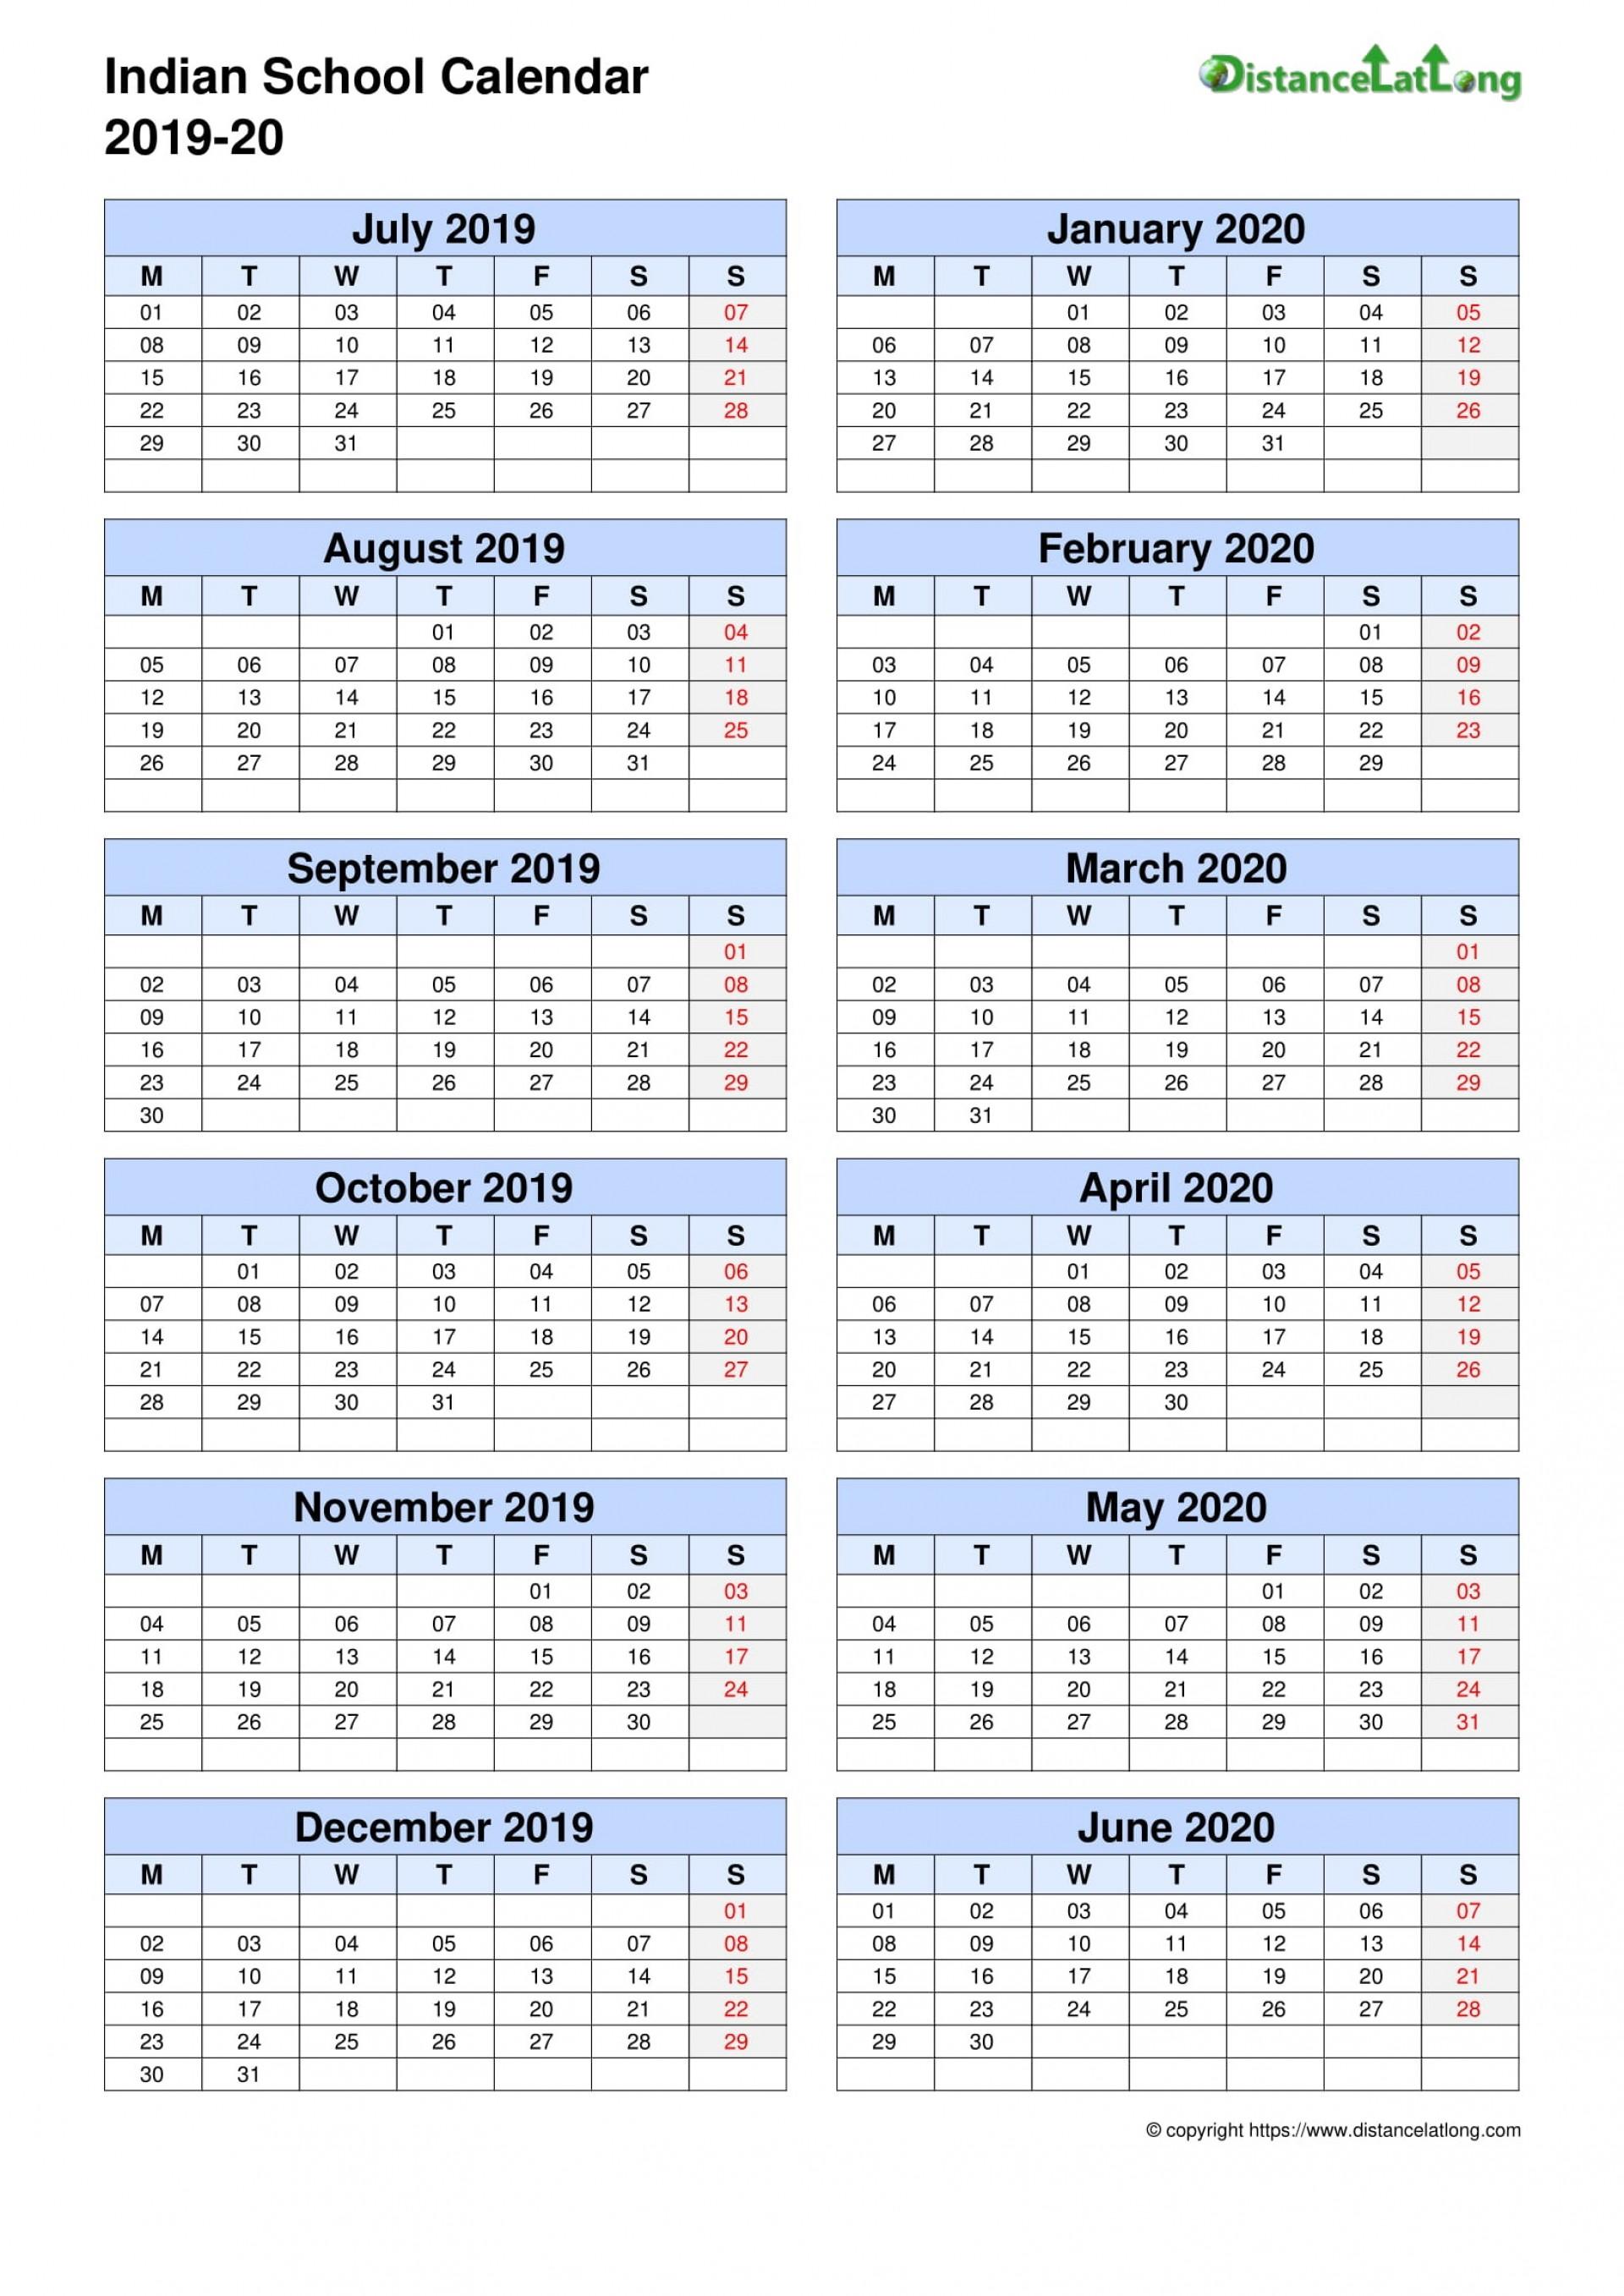 009 Remarkable School Year Calendar Template High Def  Excel 2019-20 Word1920